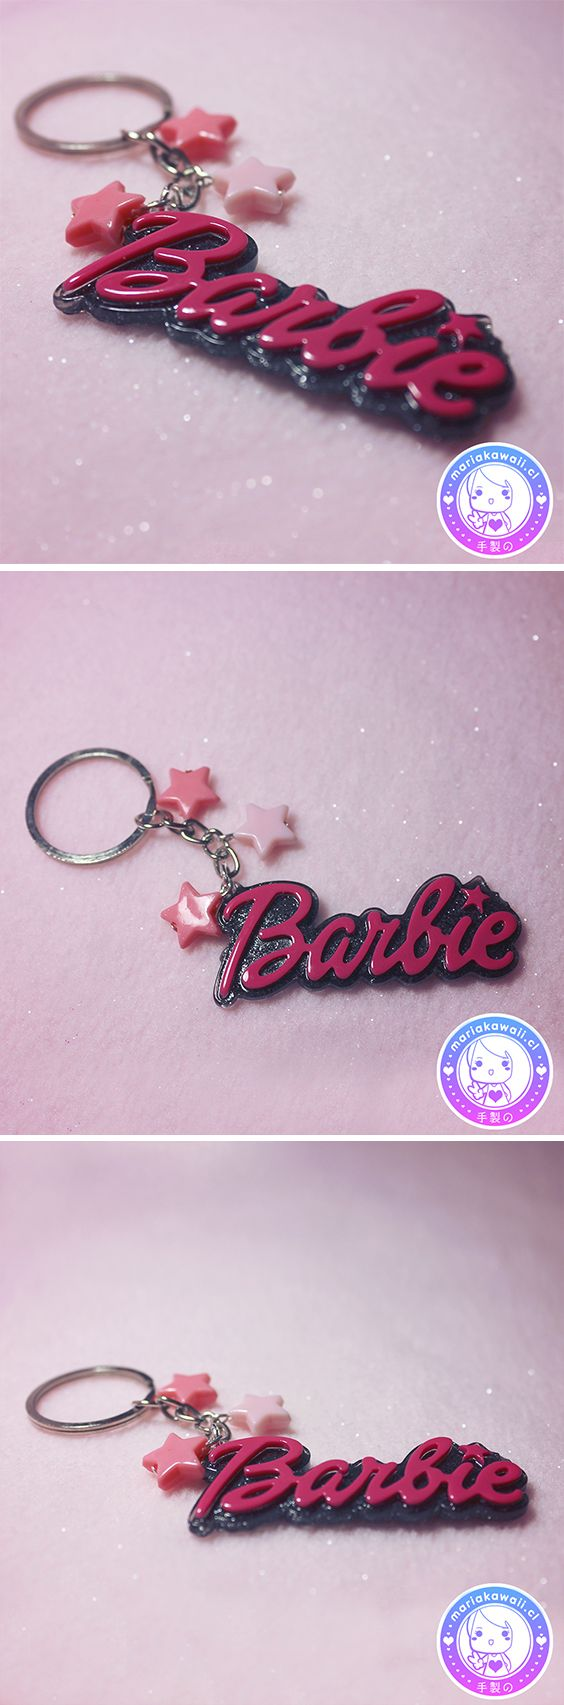 María Kawaii Store ♥ Keychain Barbie Black and Fuchsia